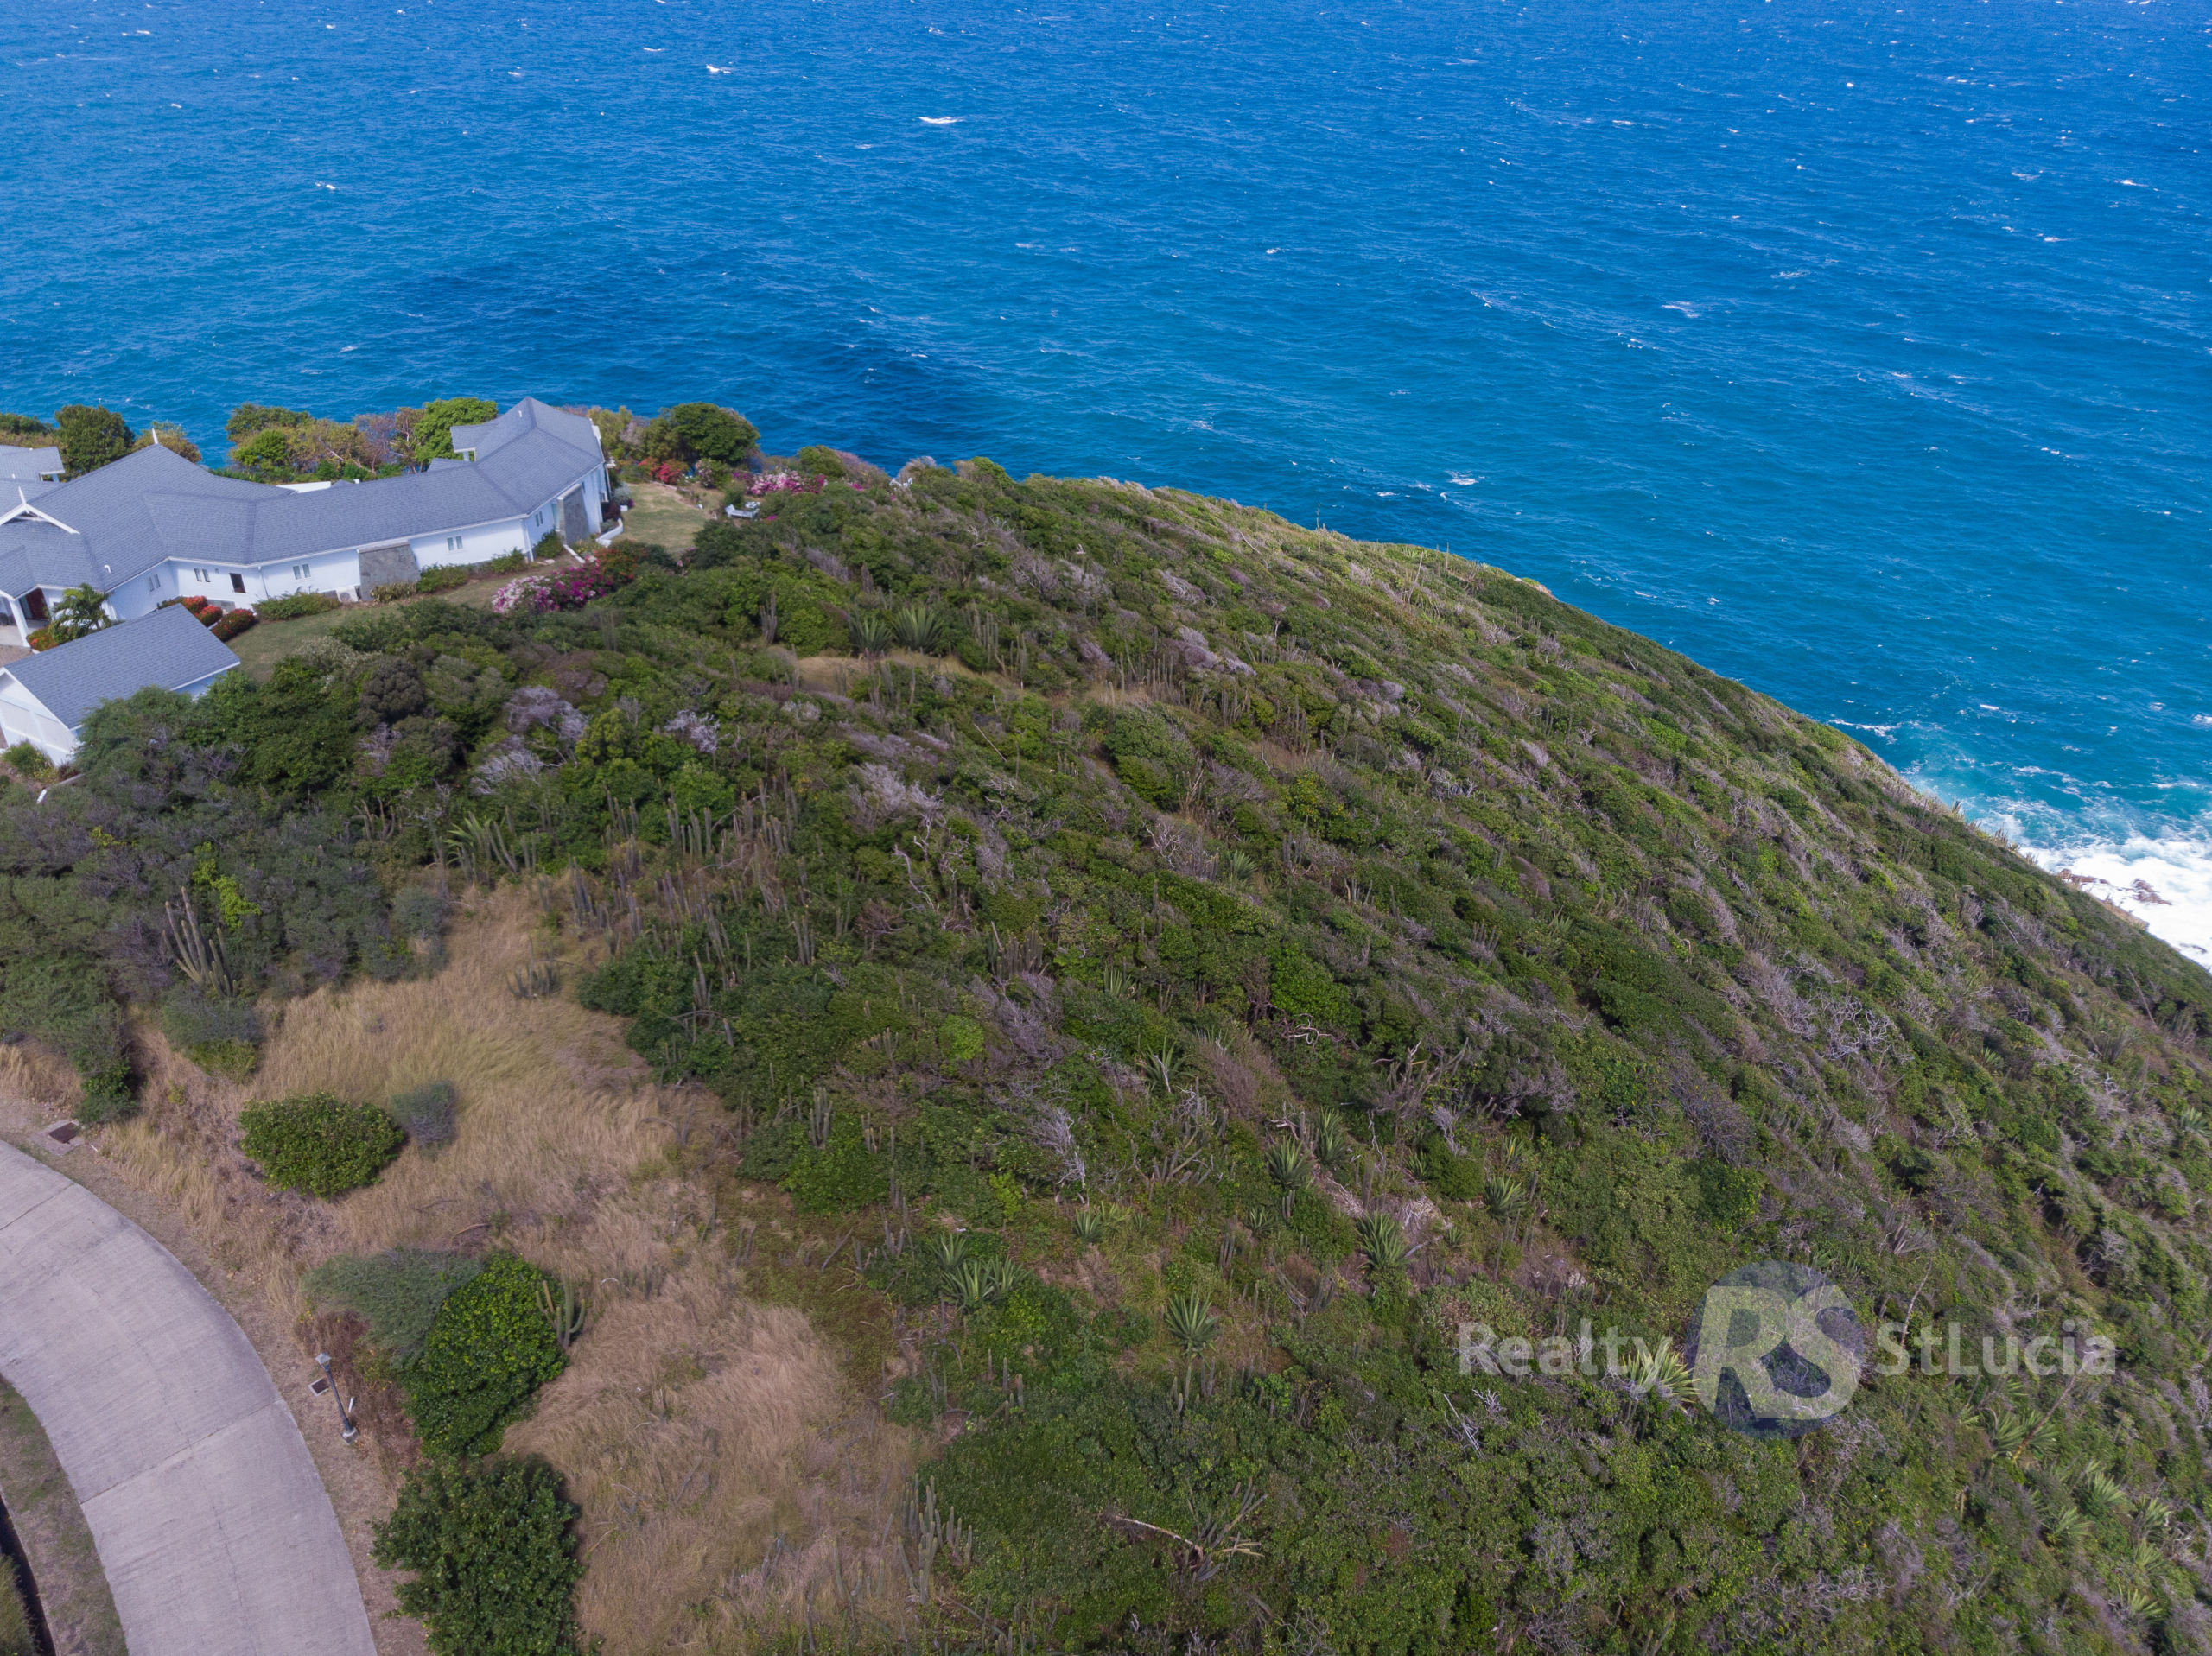 seabreeze hills cap estate St. Lucia